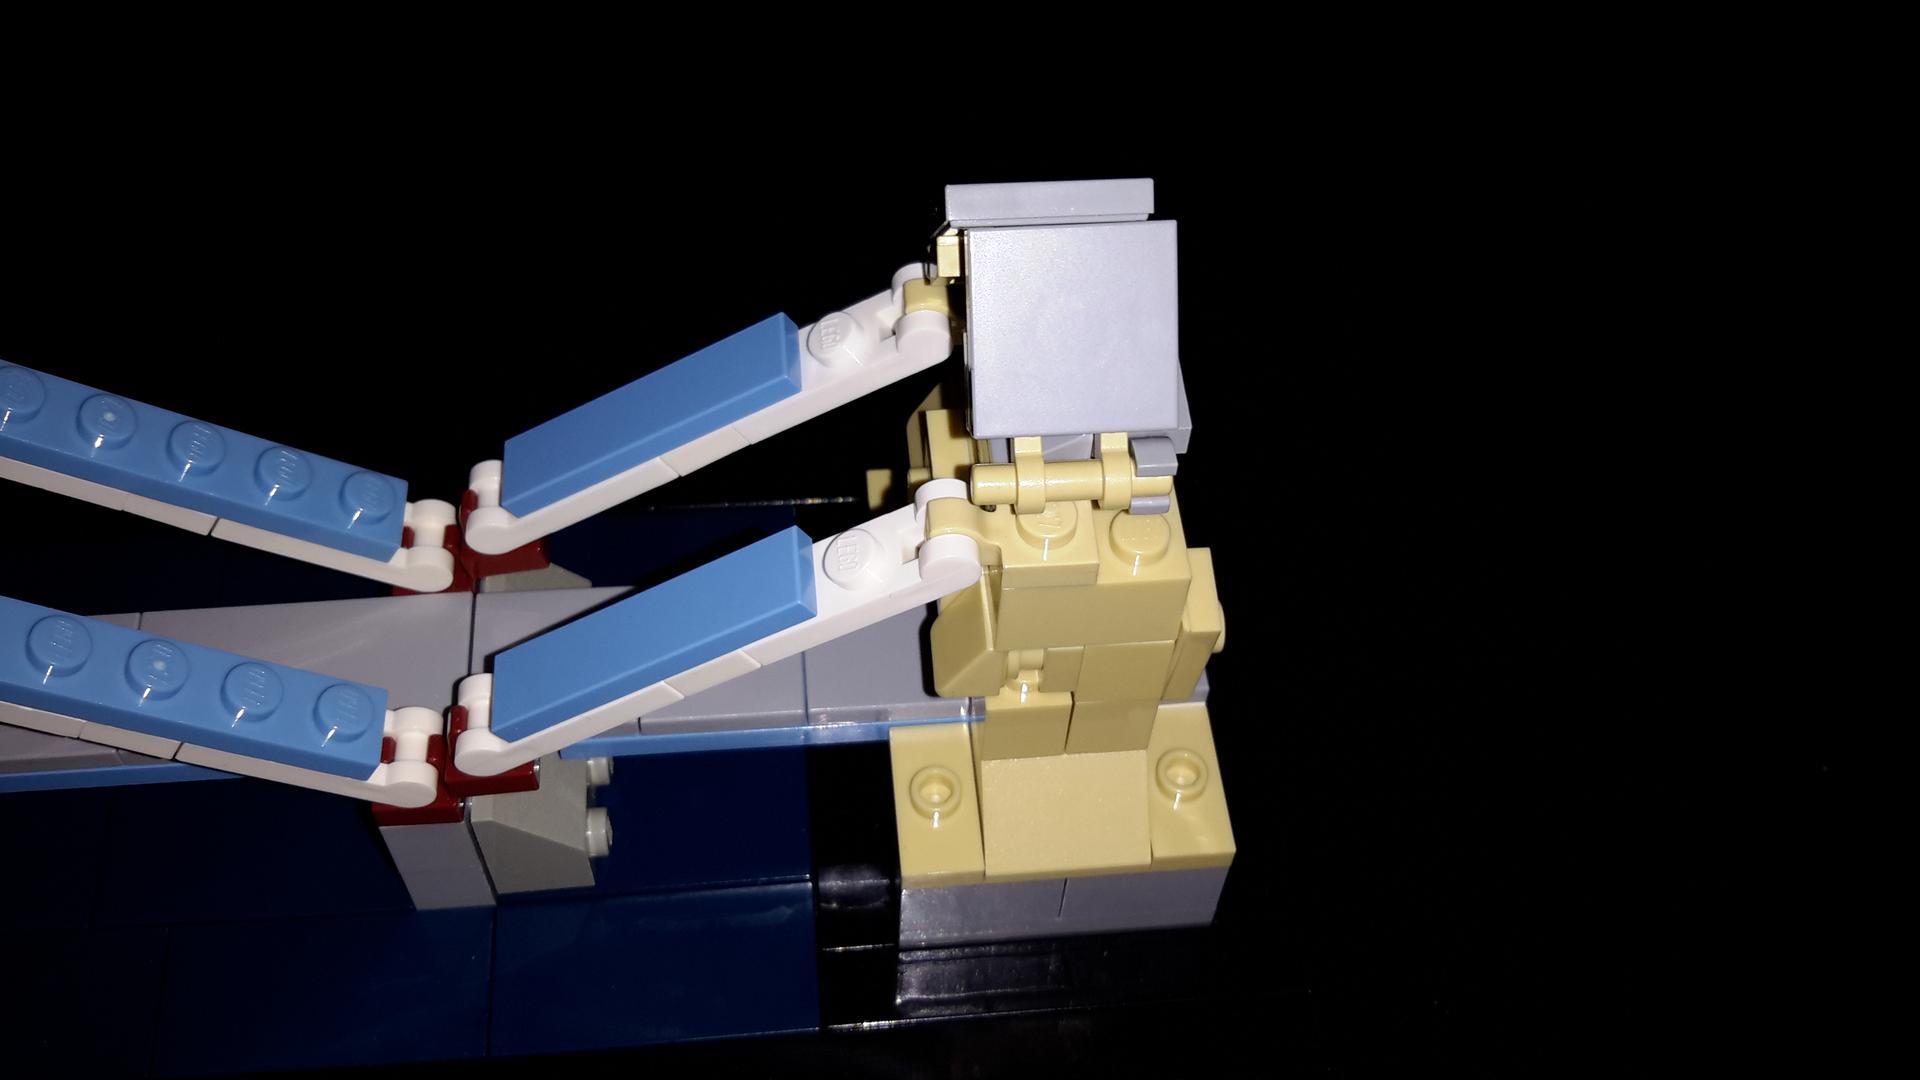 lego architecture london instructions